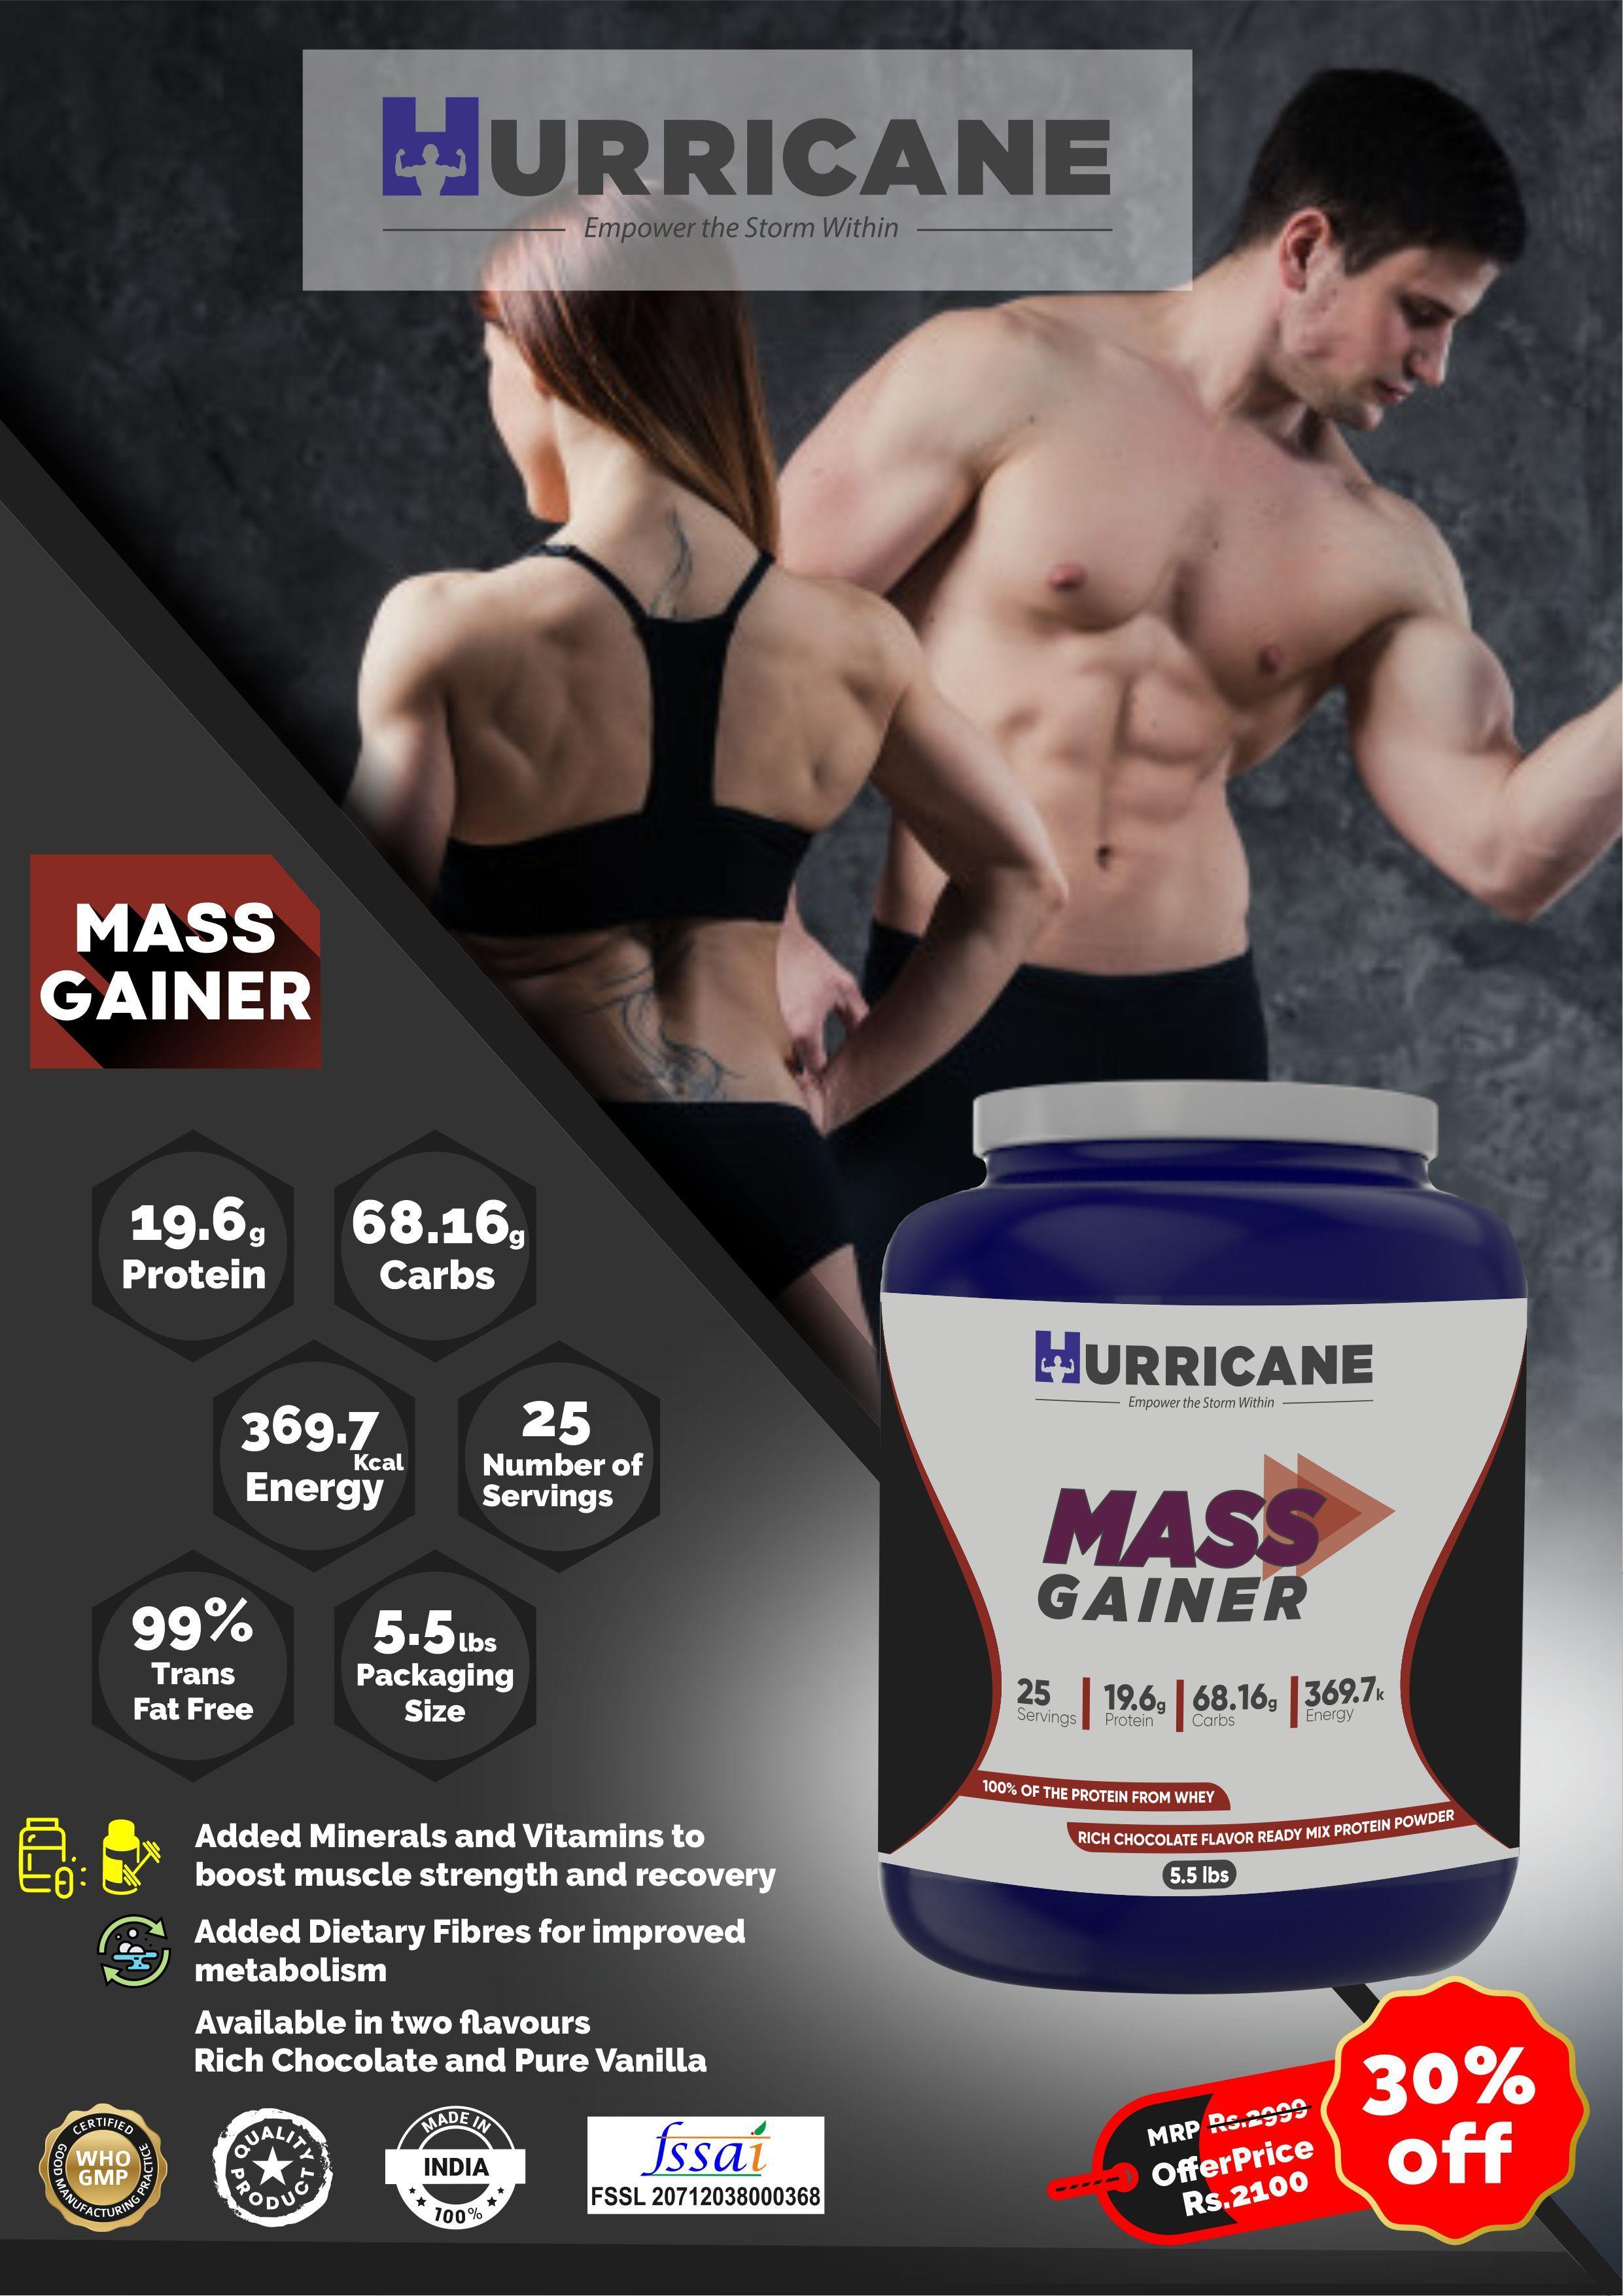 Hurricane Mass Gainer - Chocolate Flavour